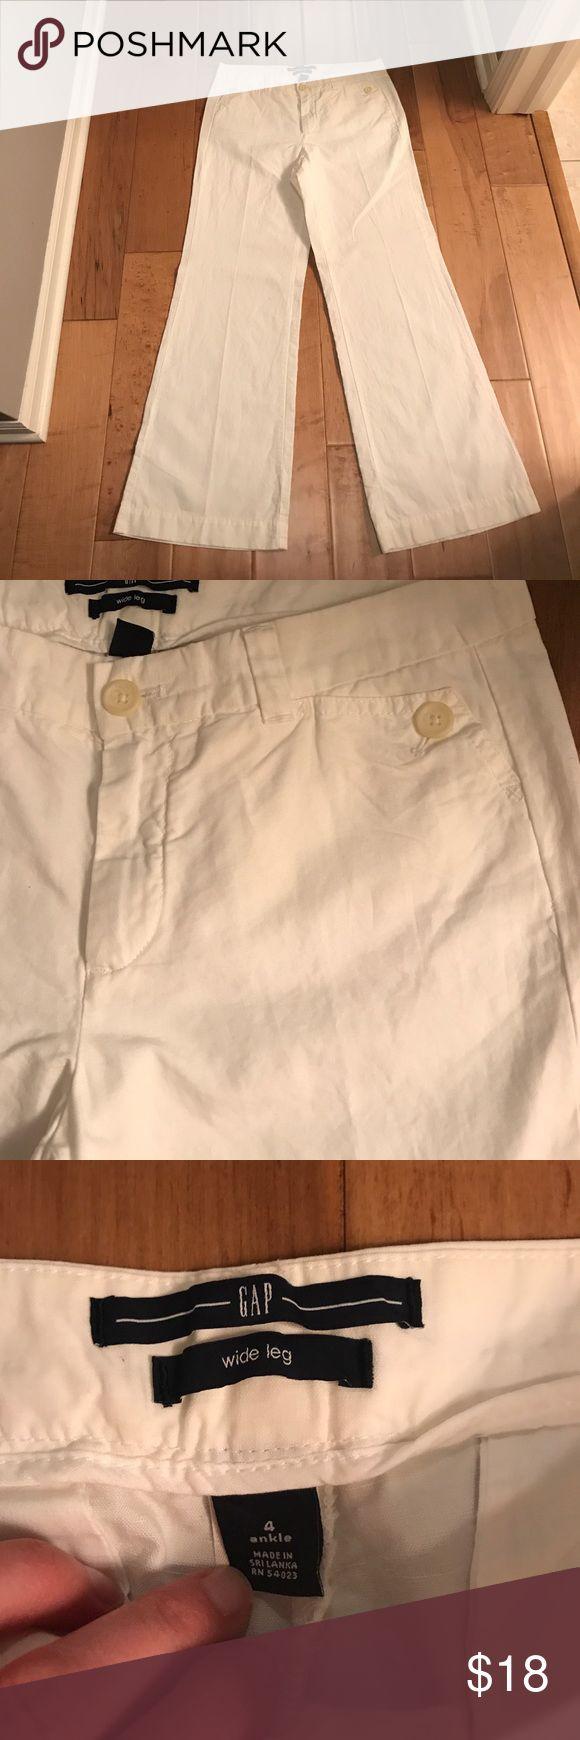 Never Worn White GAP Wide Leg Pants Sailor style pants in wide leg from GAP. Never worn. Sail cloth like cotton/Linen material. Button accents. Size is 4 ankle which means petite length. GAP Pants Wide Leg